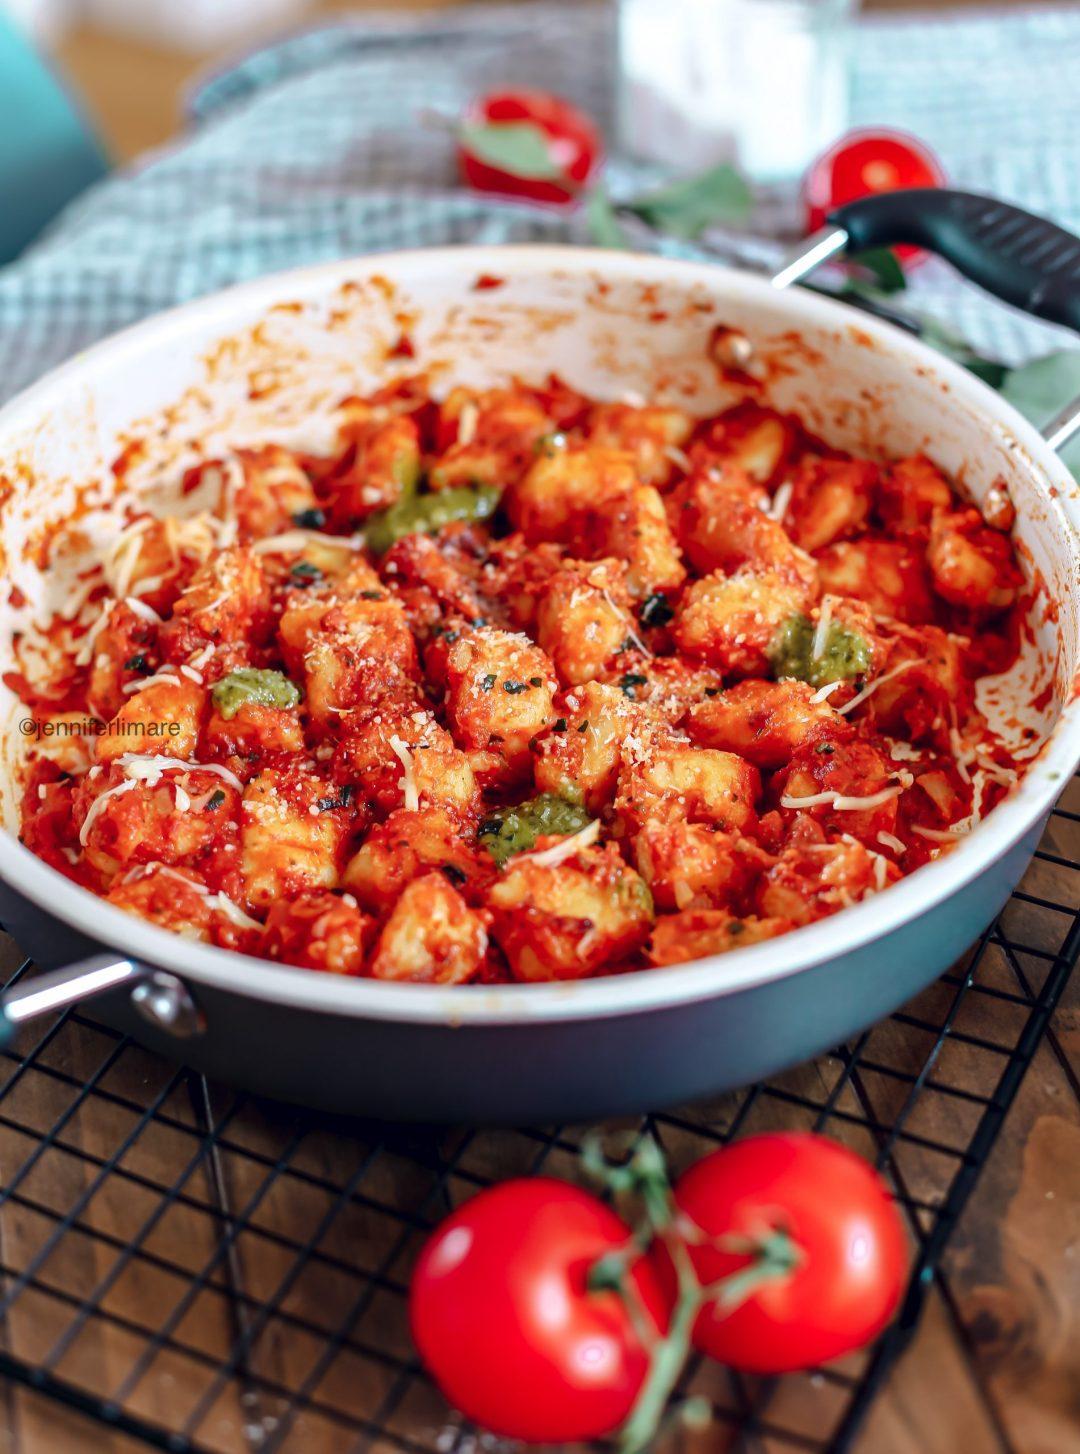 GNOCCHIS MAISON SANS GLUTEN sauce tomate pesto